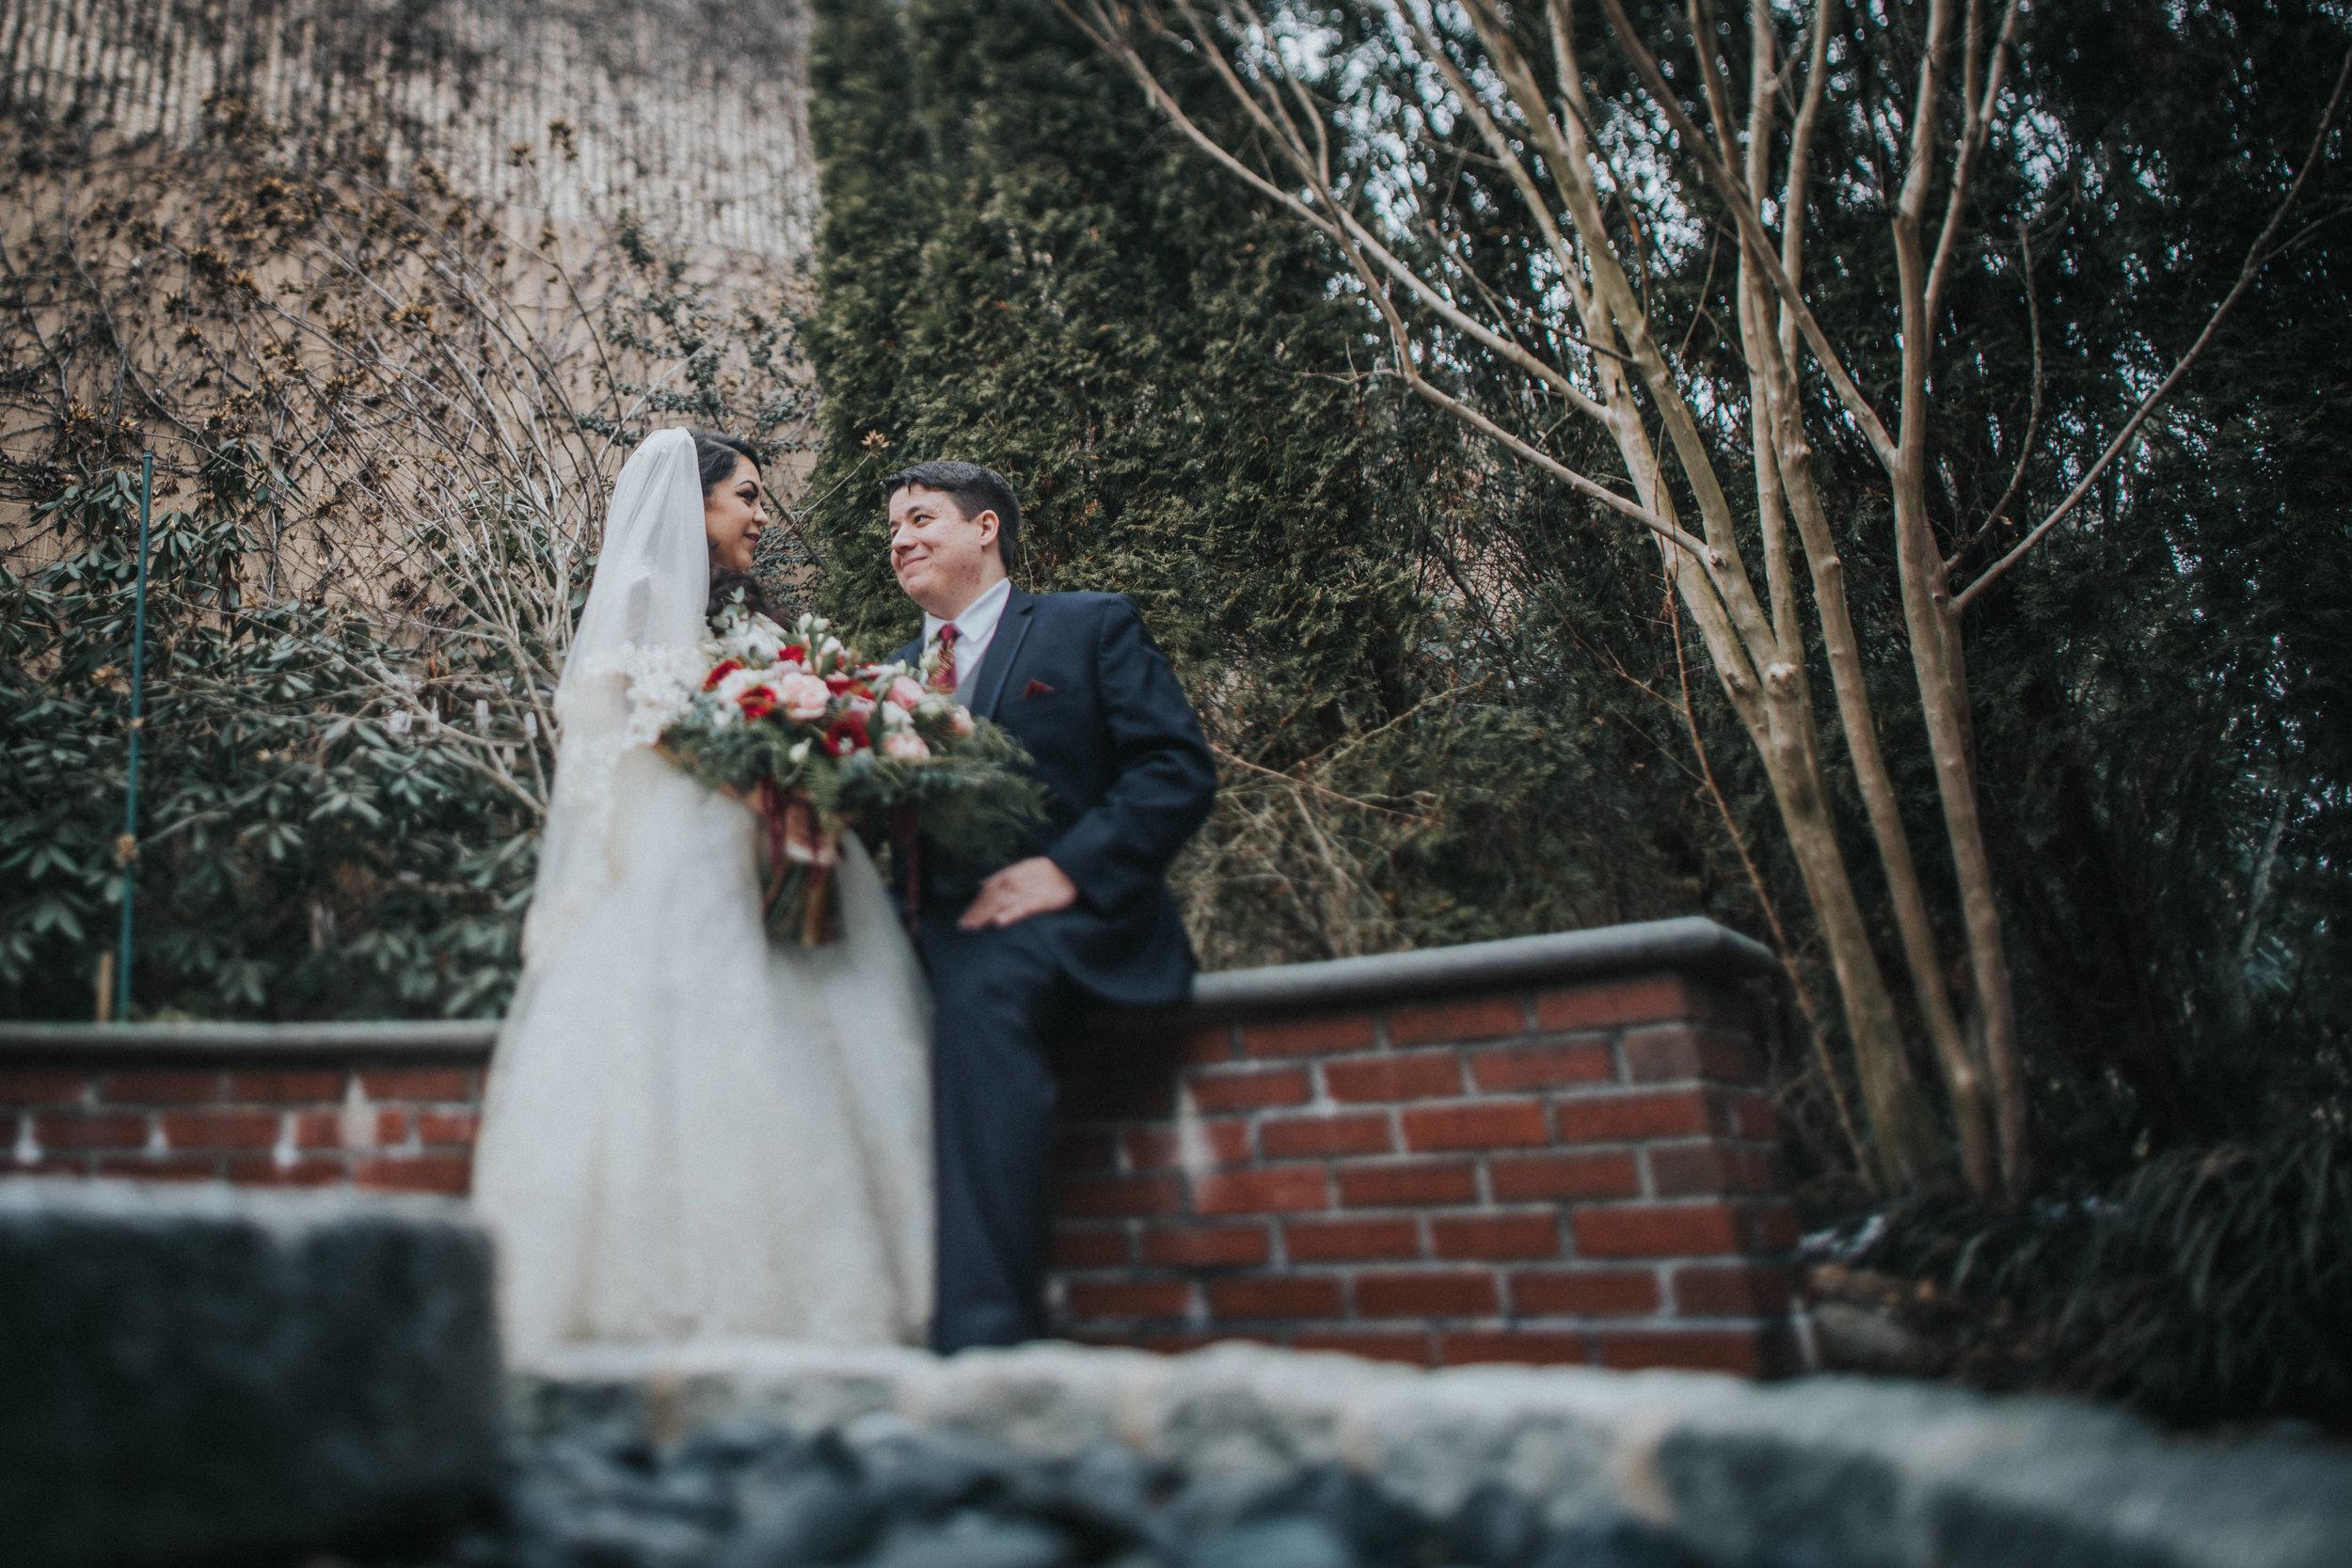 New-Jersey-Wedding-Photographer-ReceptionCenter-Valeria&Mike-First-Look-Bride&Groom (62 of 69).jpg